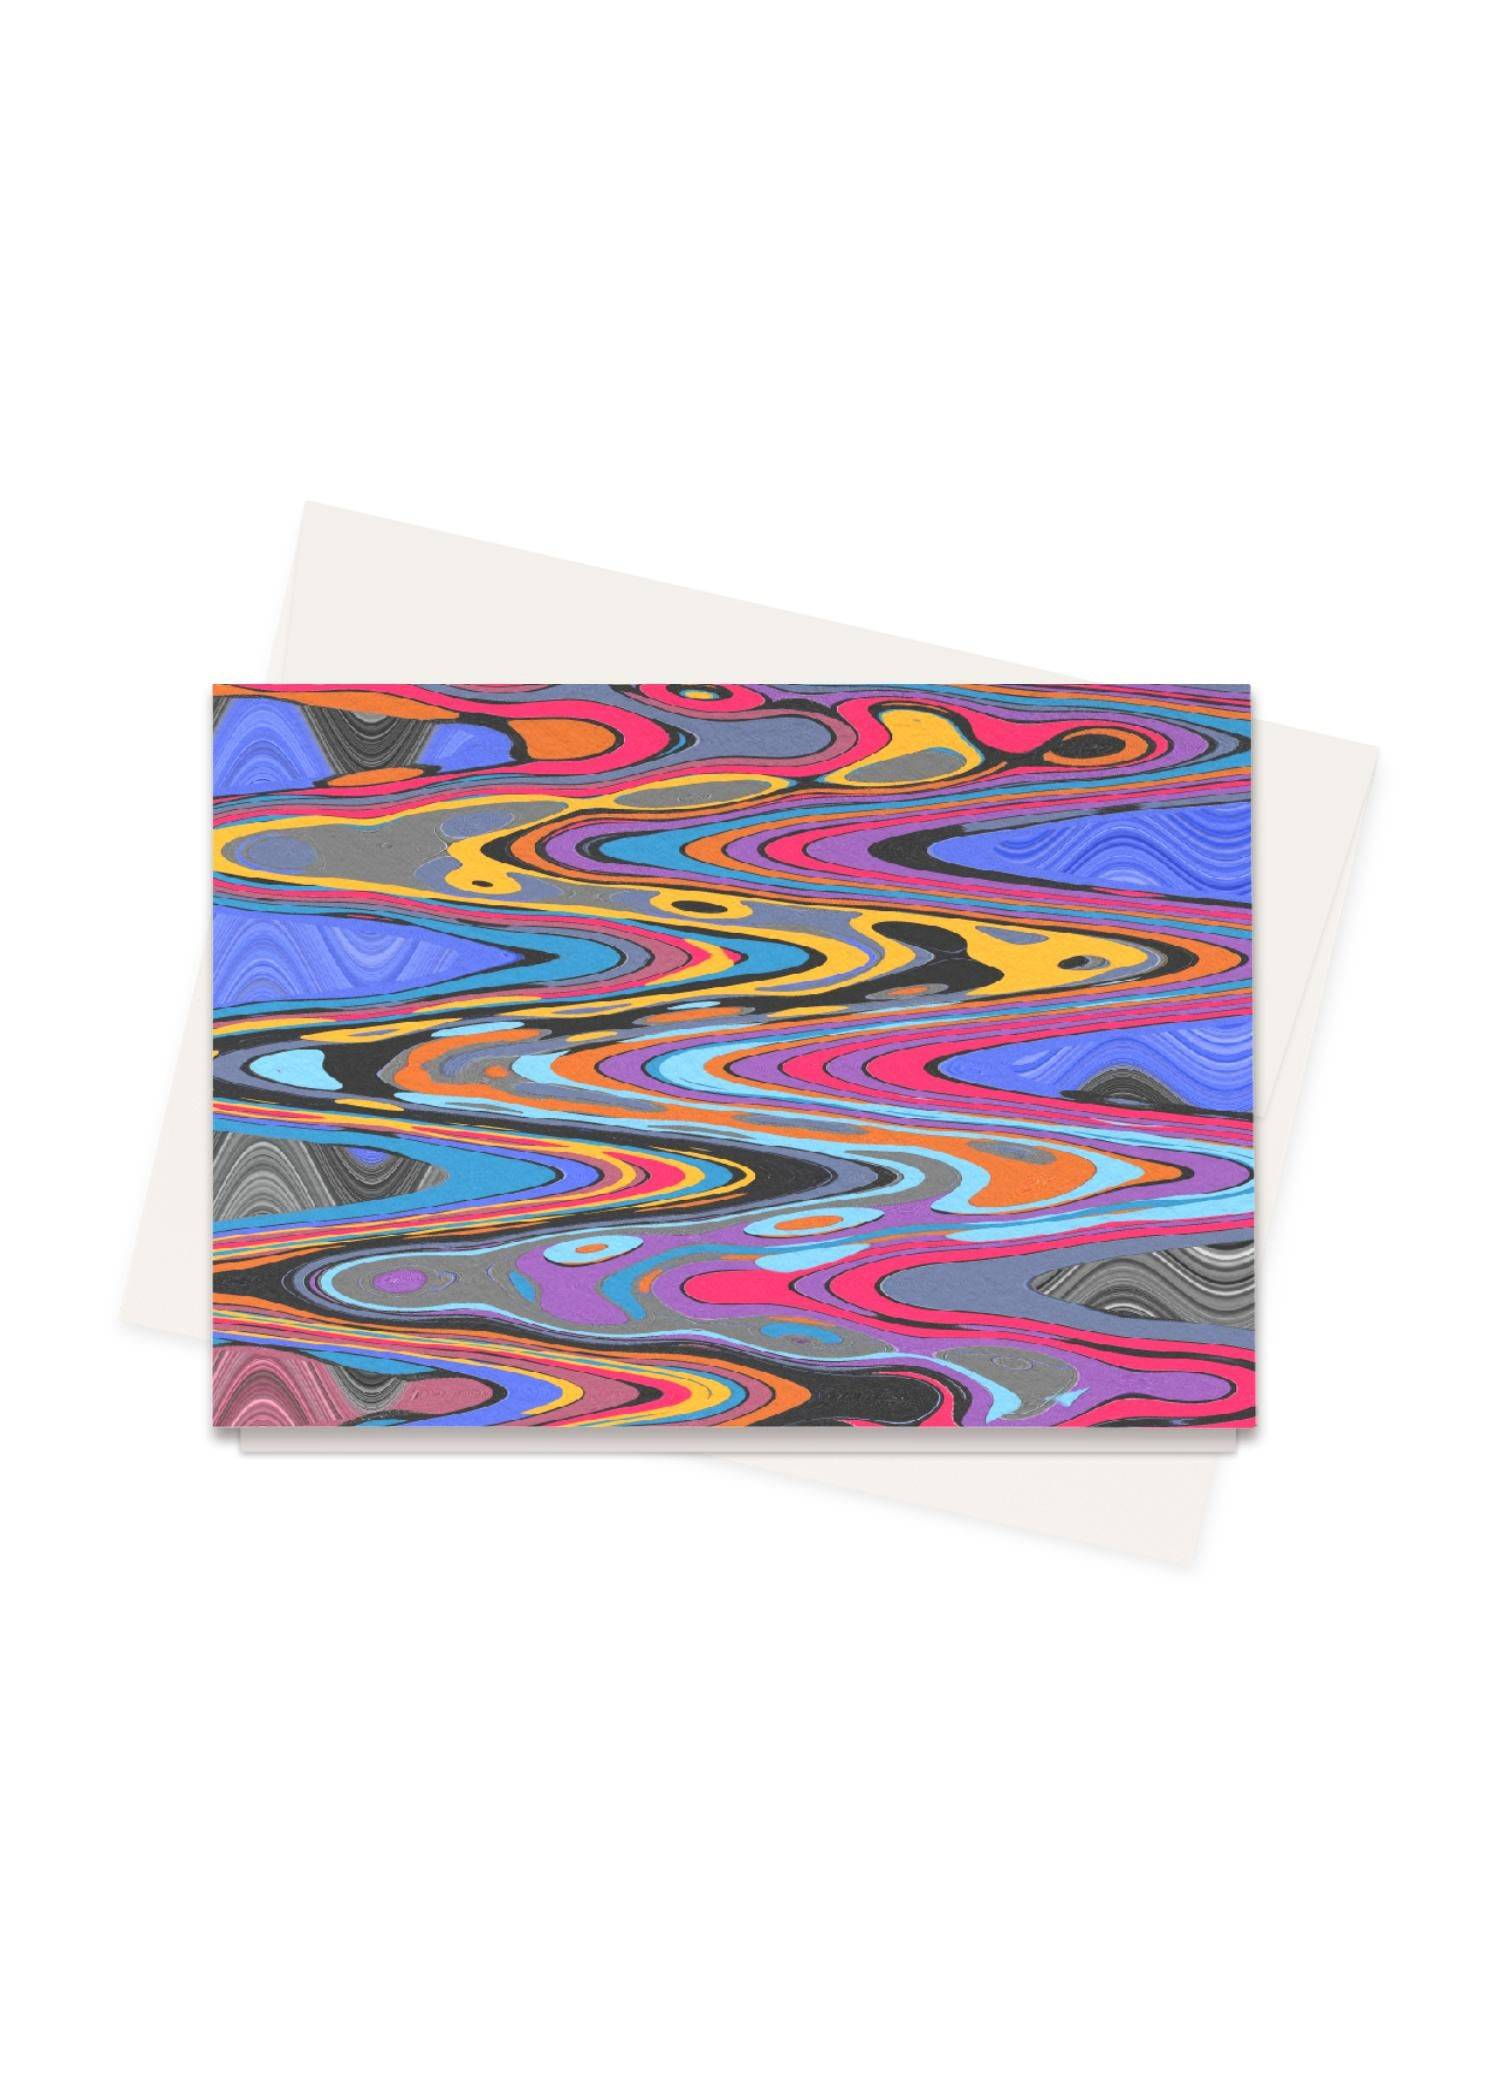 VIDA Greeting Cards Set - Vibration Pop Music 2021 by VIDA Original Artist  - Size: Set of 16